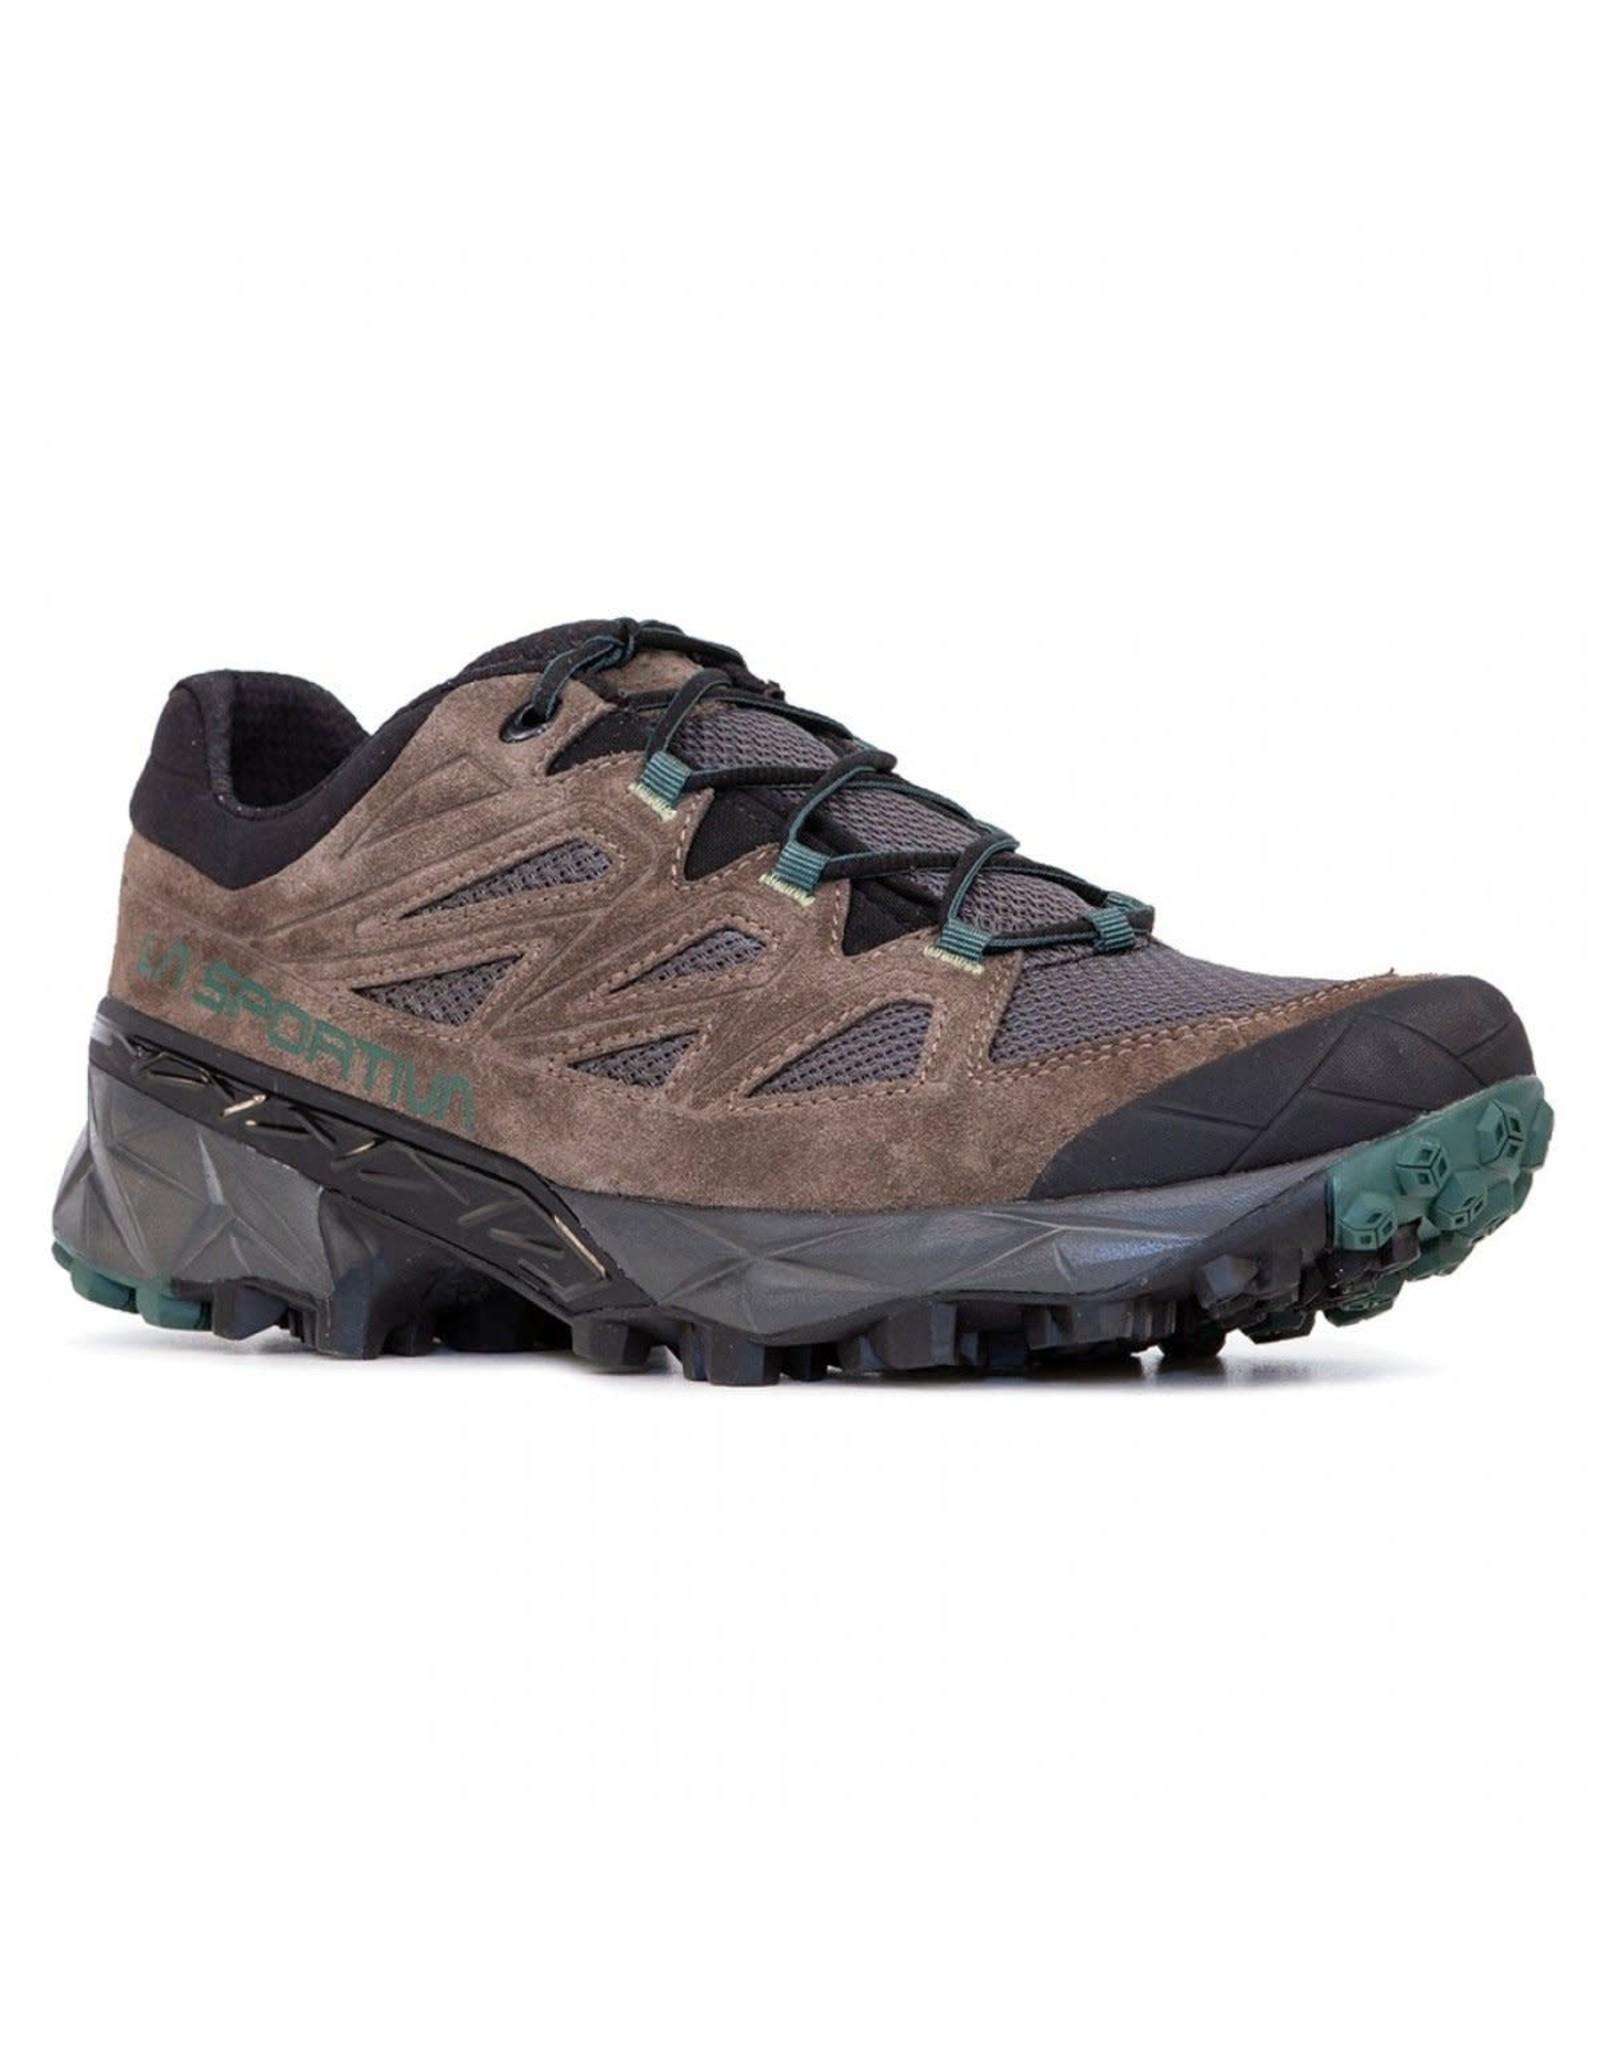 La Sportiva La Sportiva Trail Ridge Low - Men